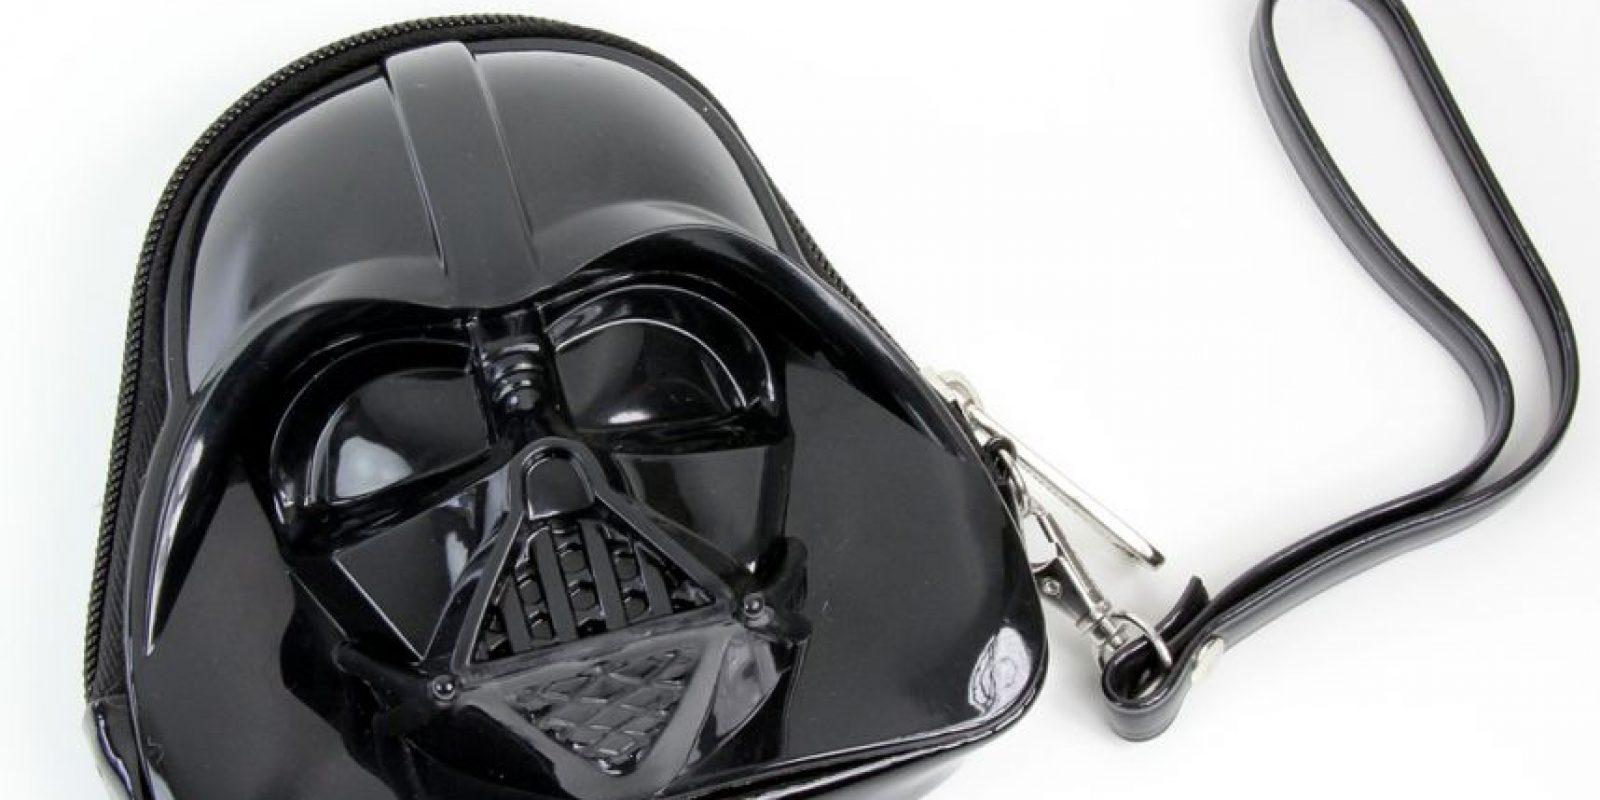 Torrid sacó un clutch de Darth Vader, entre otros personajes. Foto:vía Torrid